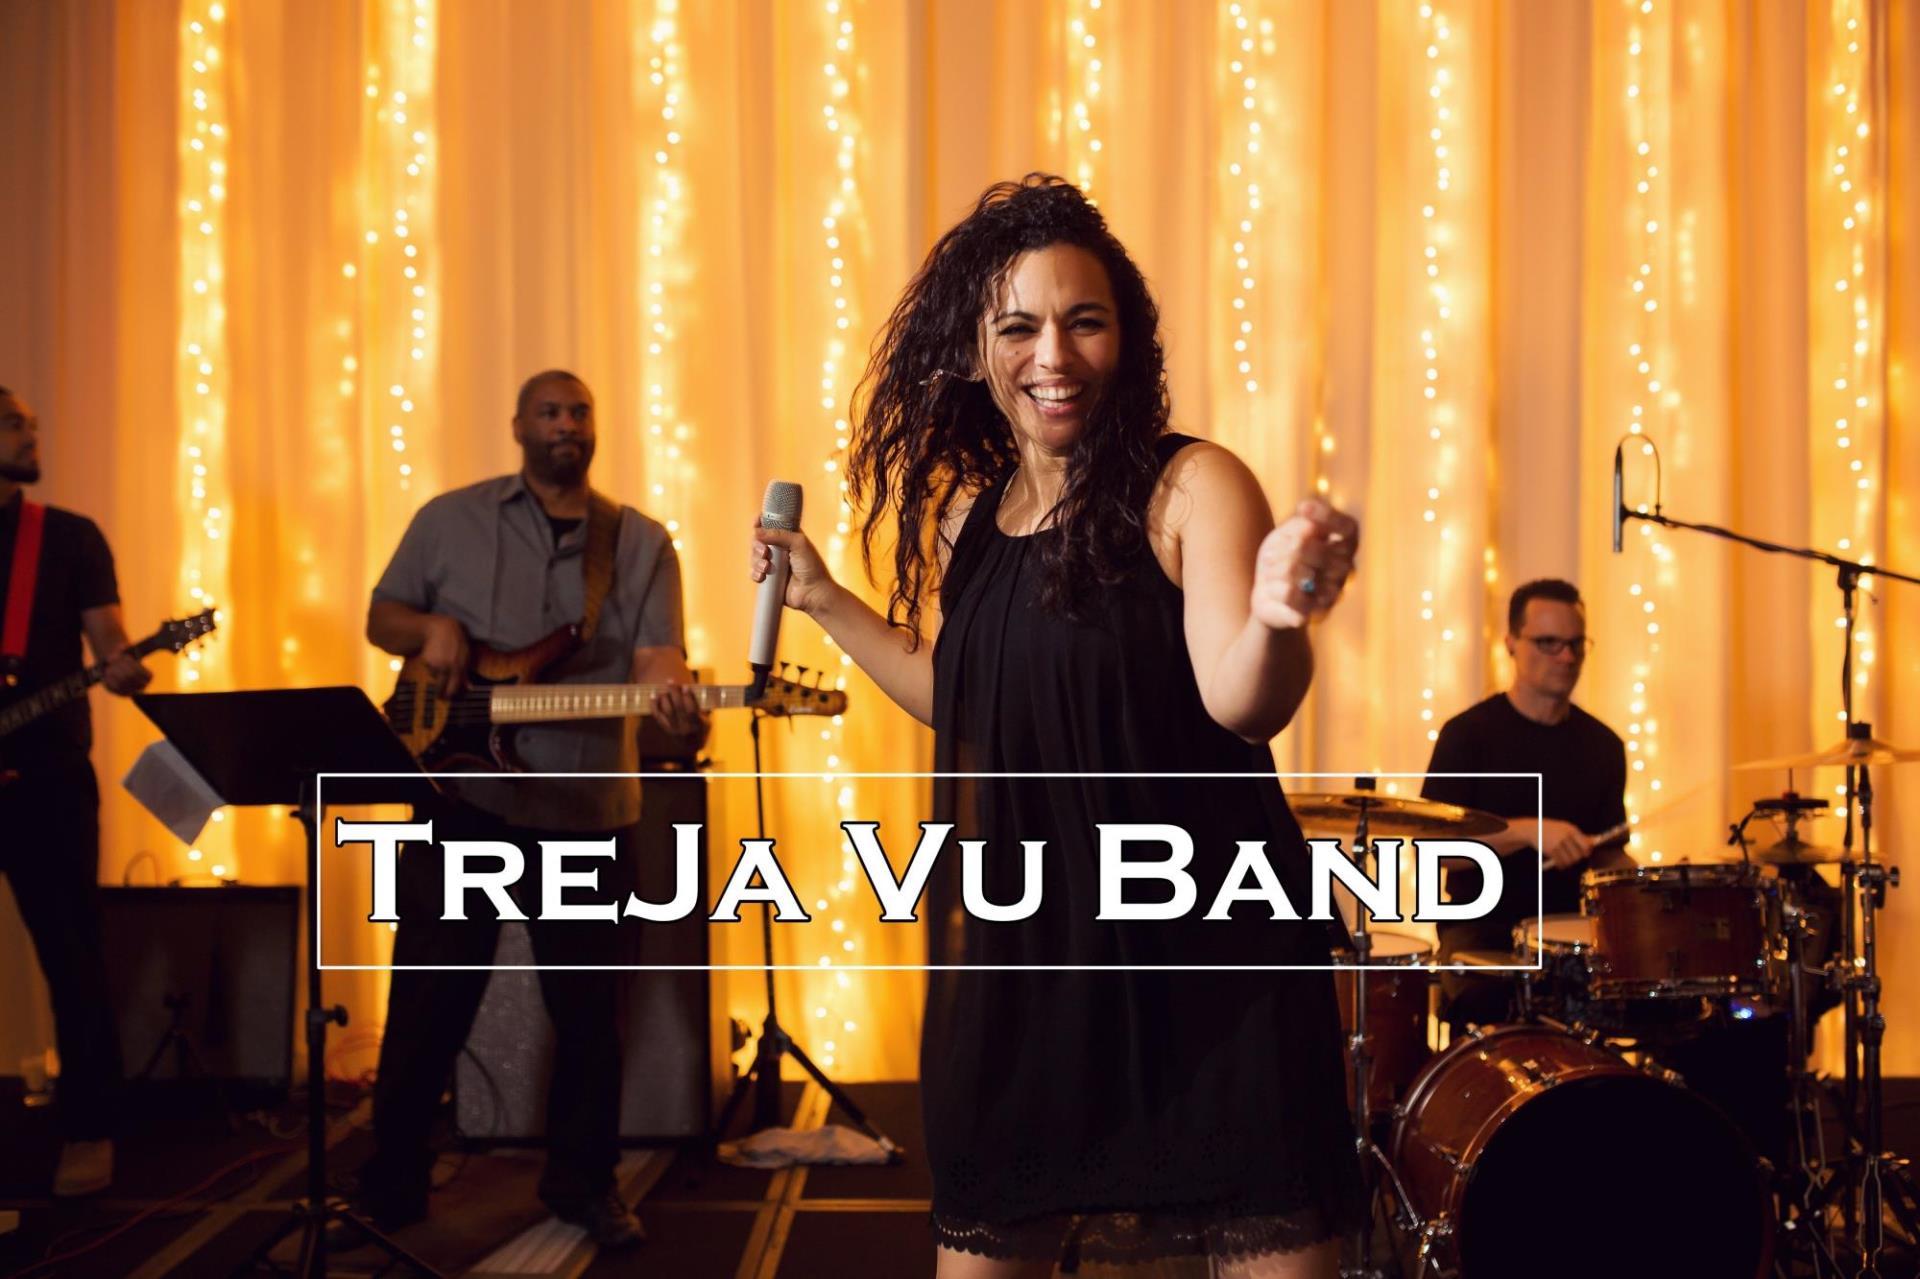 TréJà Vu Band